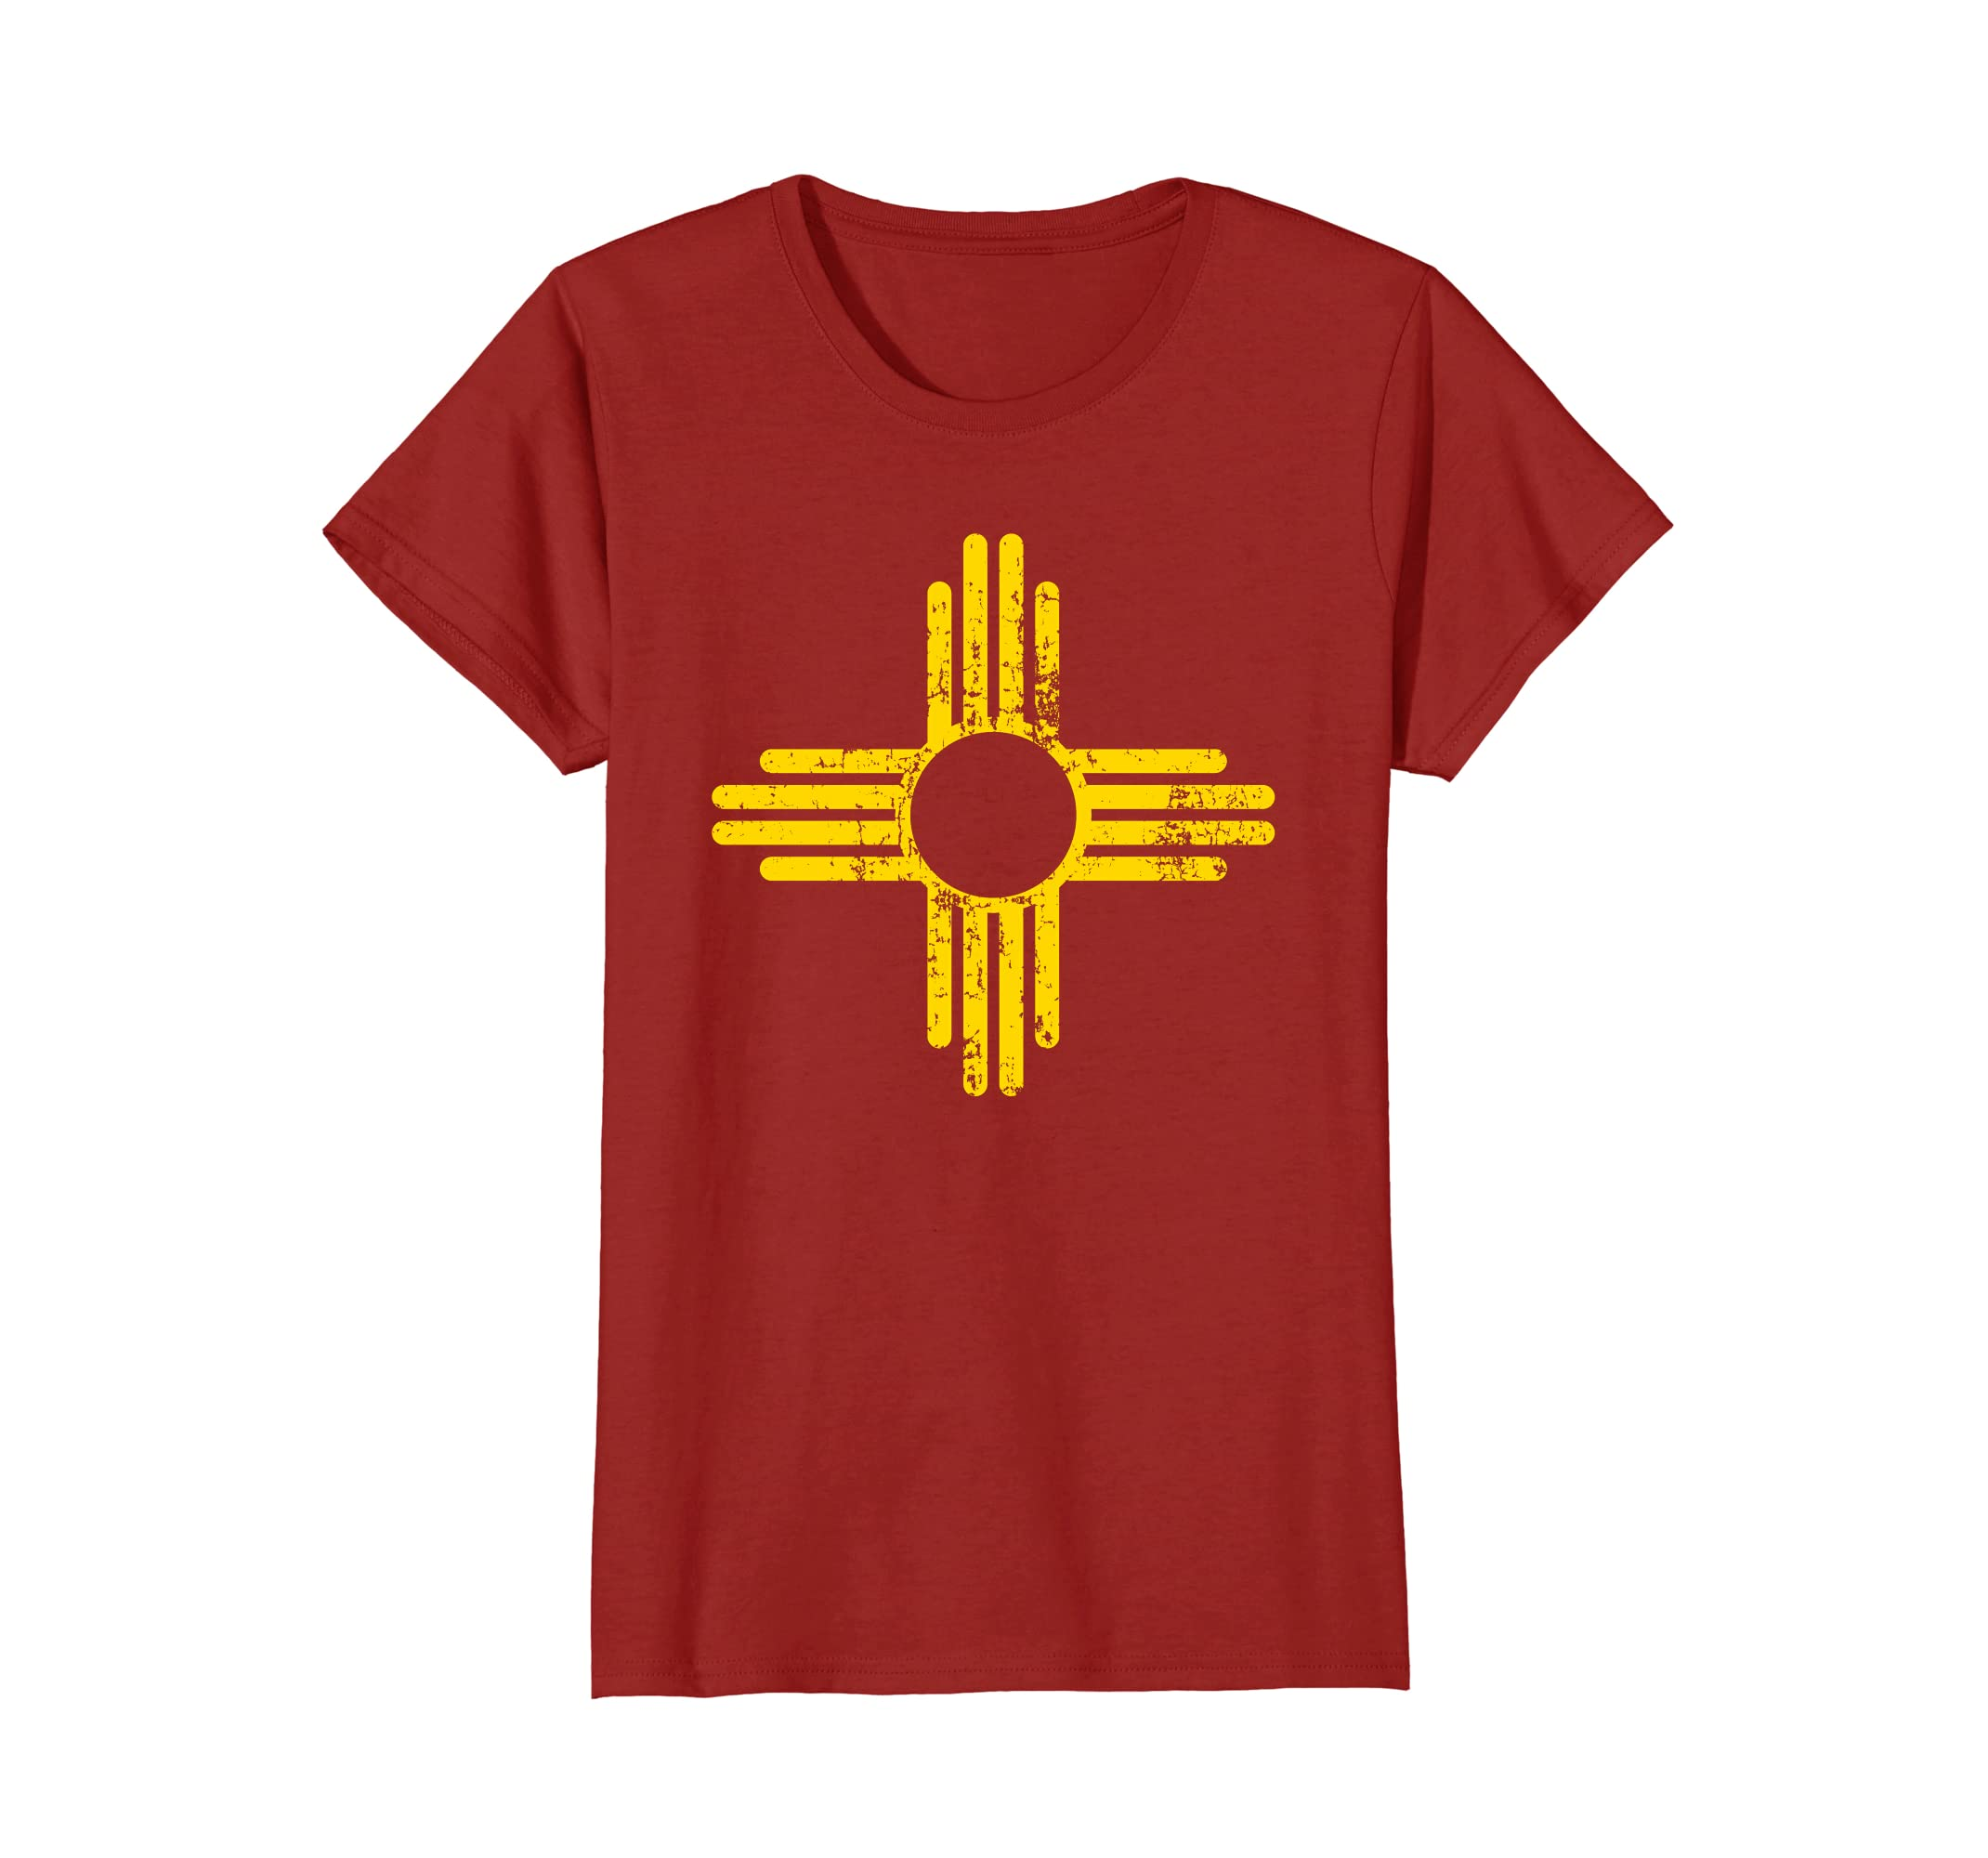 27c887ea3 Amazon.com: New Mexico Flag Shirt Distressed Yellow Zia Sun Alone Shirt:  Clothing